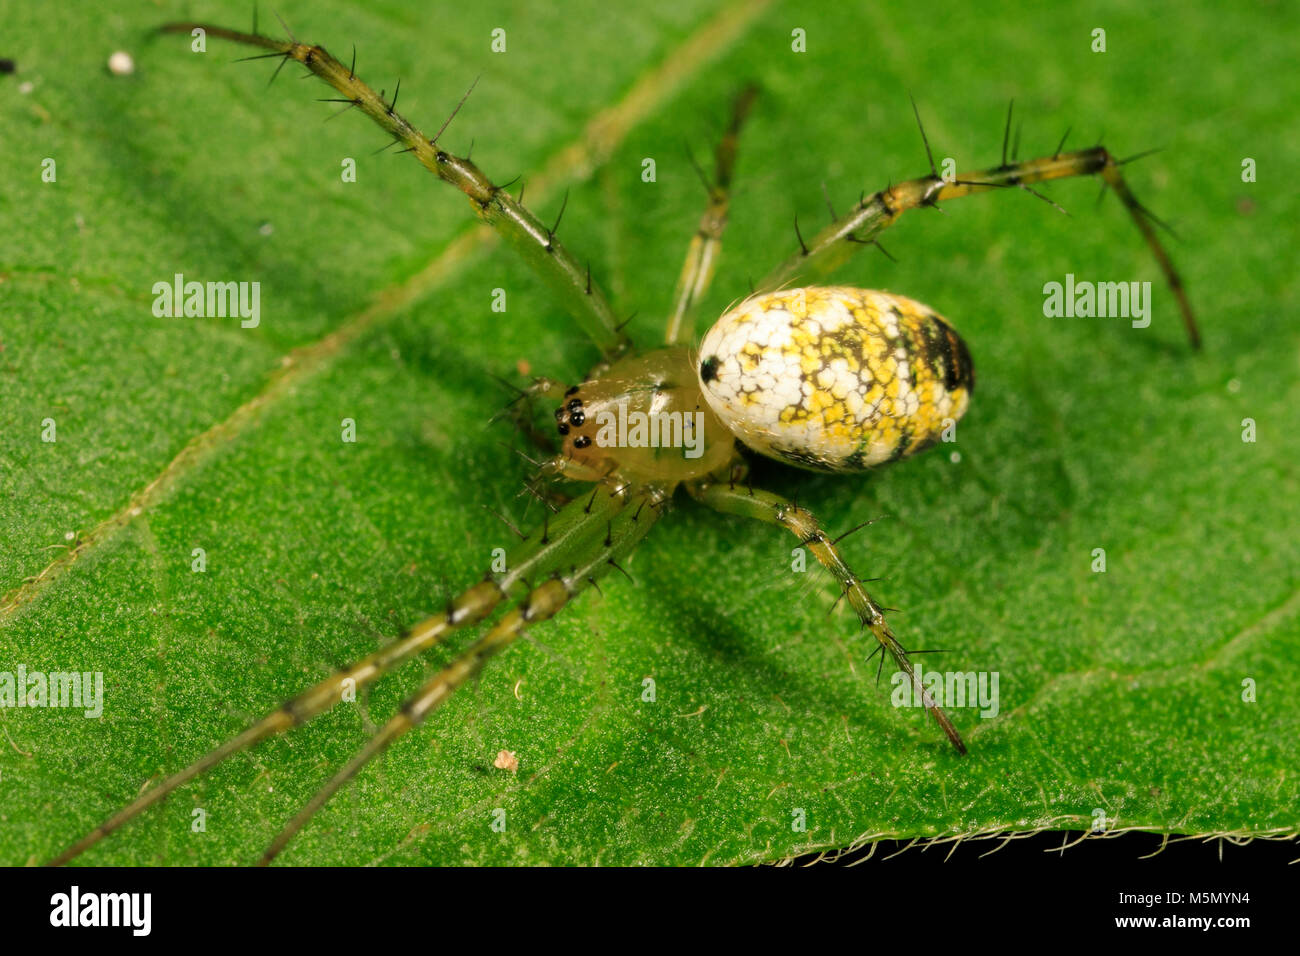 Greenlegged orbweaver spider (Mangora maculata) - Stock Image